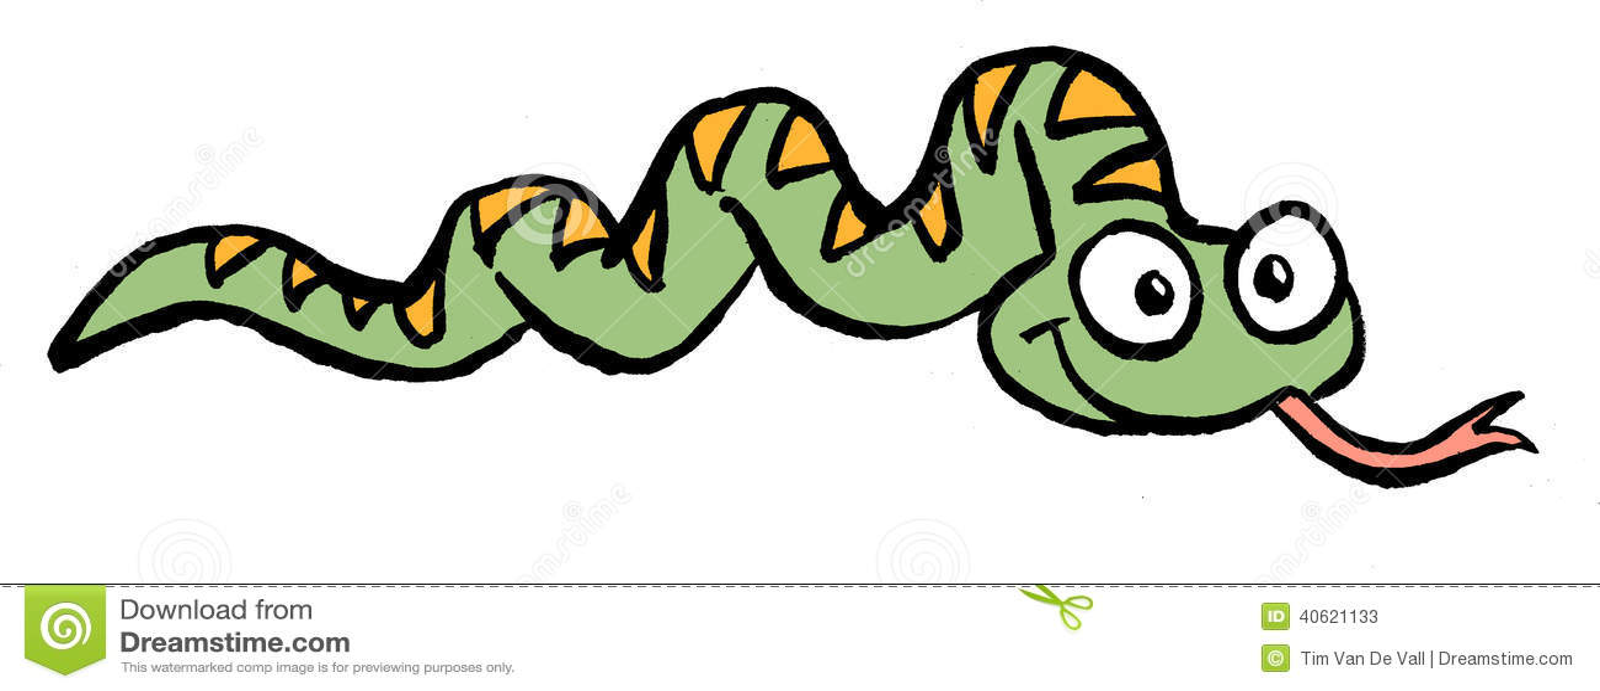 Snake Cartoon Stock Illustration - Image: 40621133